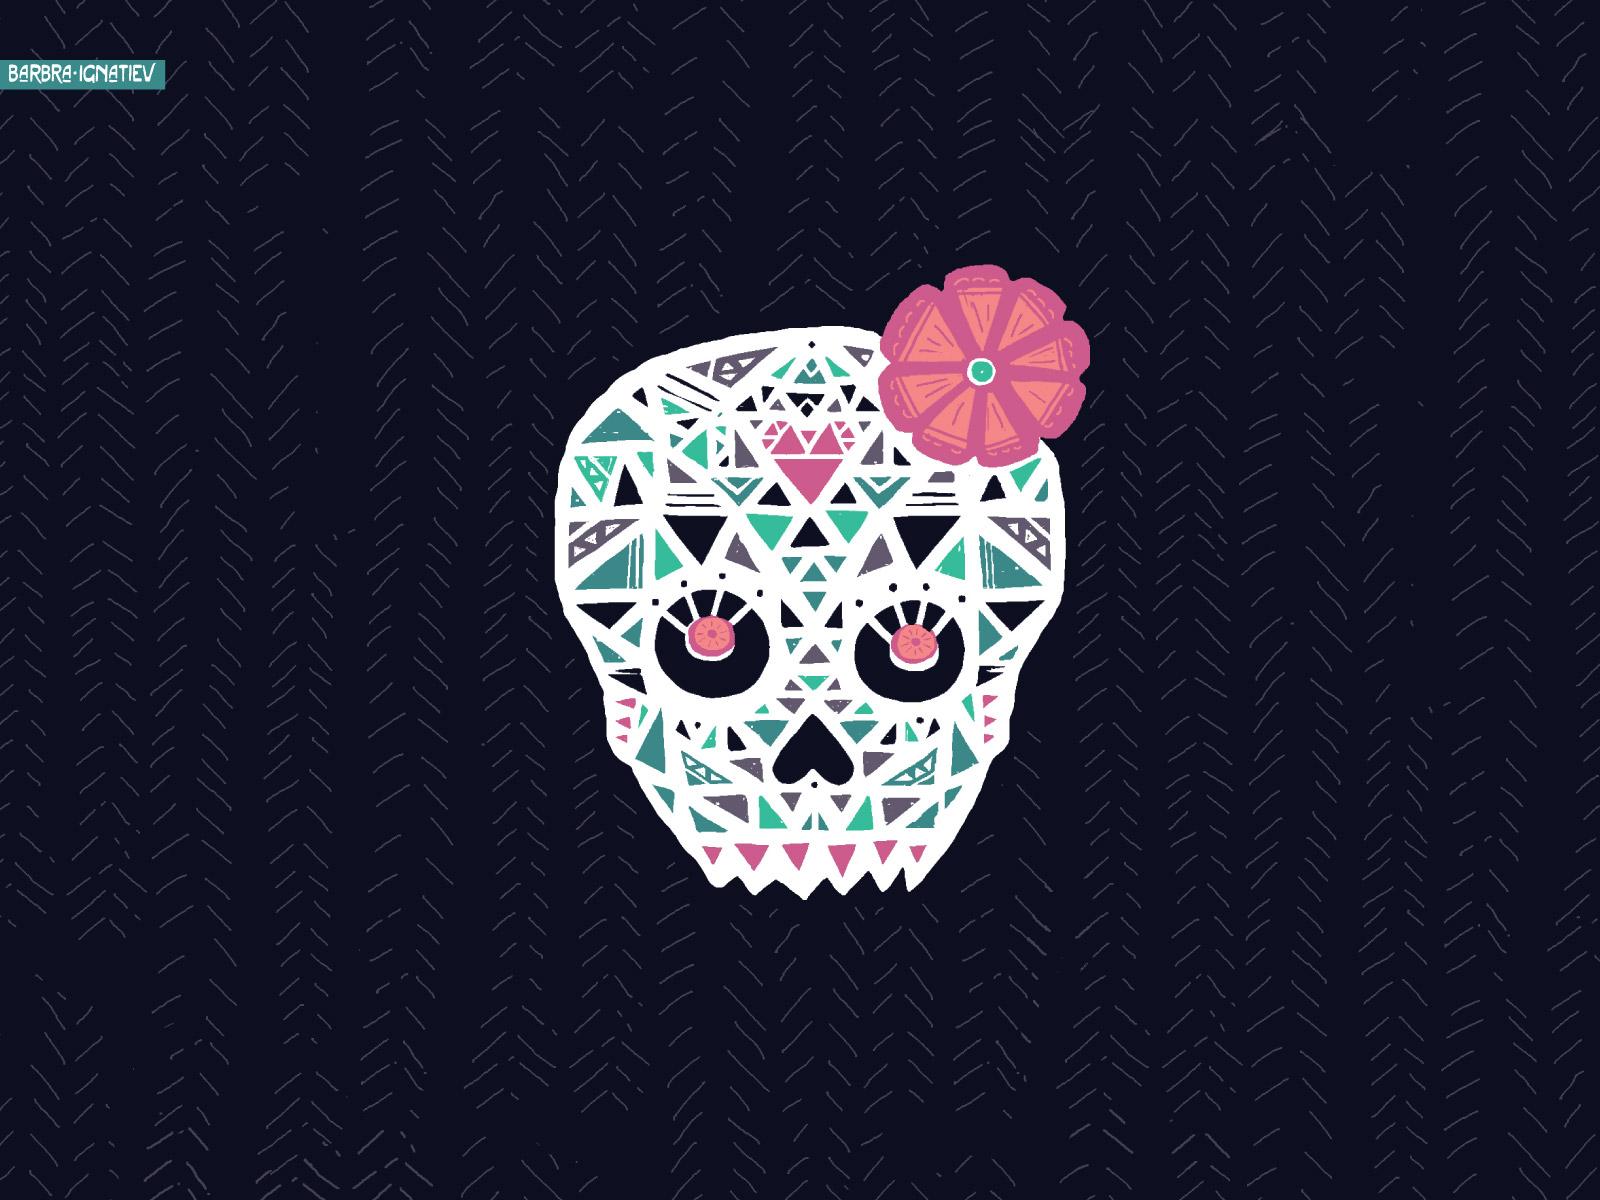 Tumblr Wallpapers Cute (24 Wallpapers)